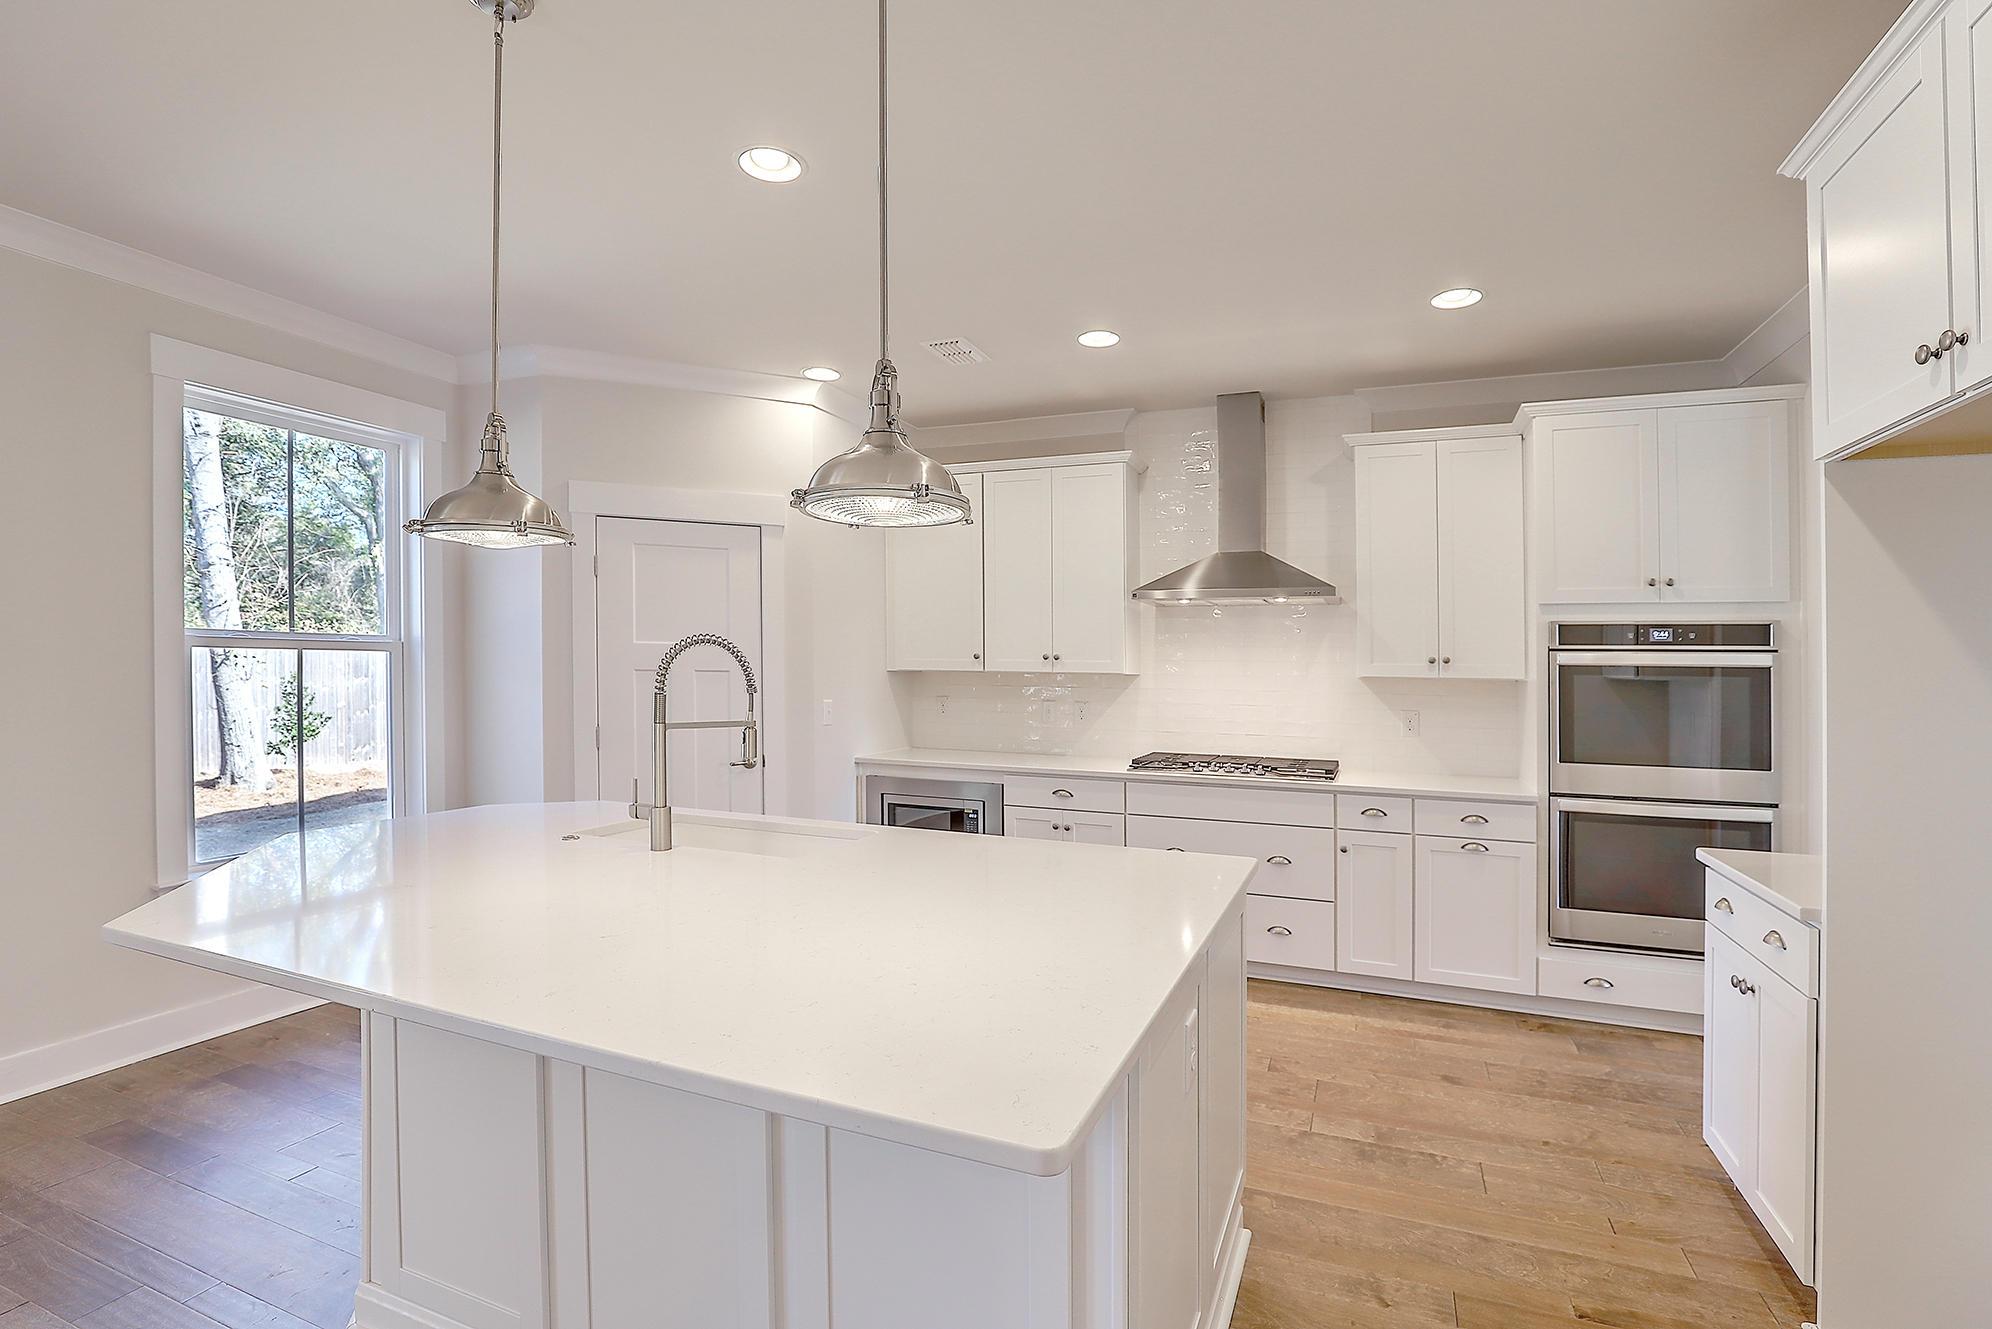 Bentley Park Homes For Sale - 1218 Gannett, Mount Pleasant, SC - 6